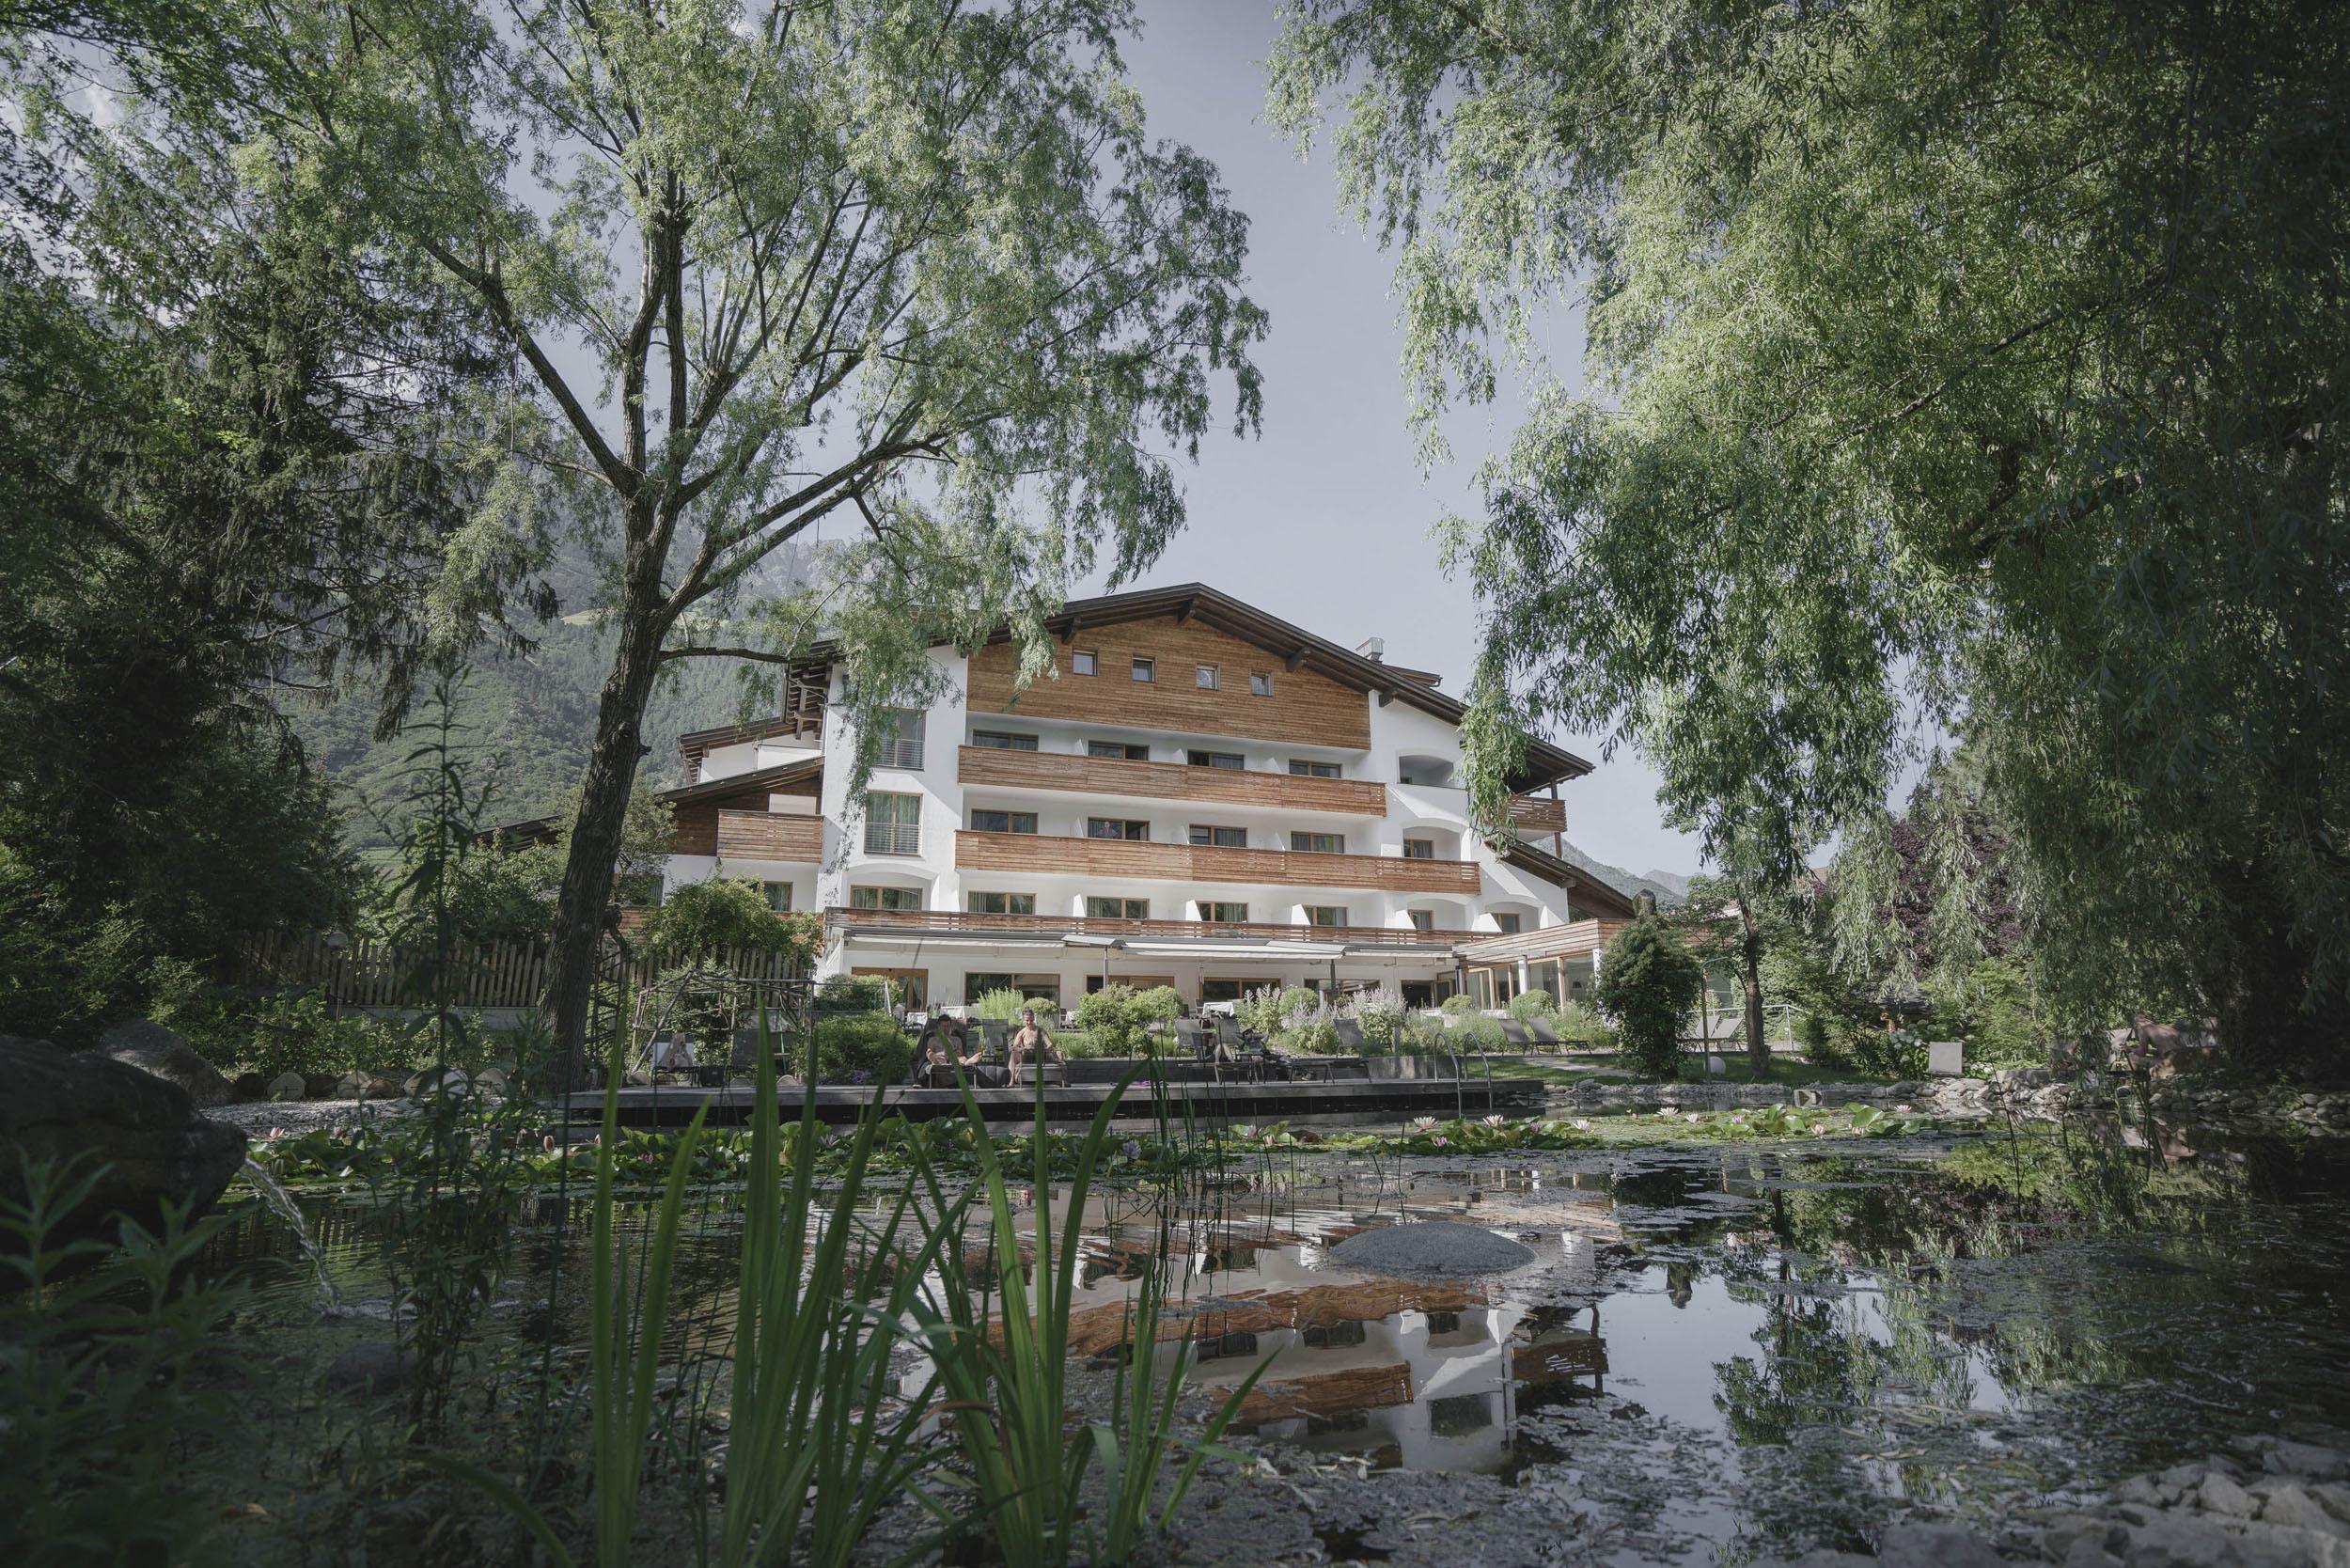 LA VIMEA Biotique Hotel